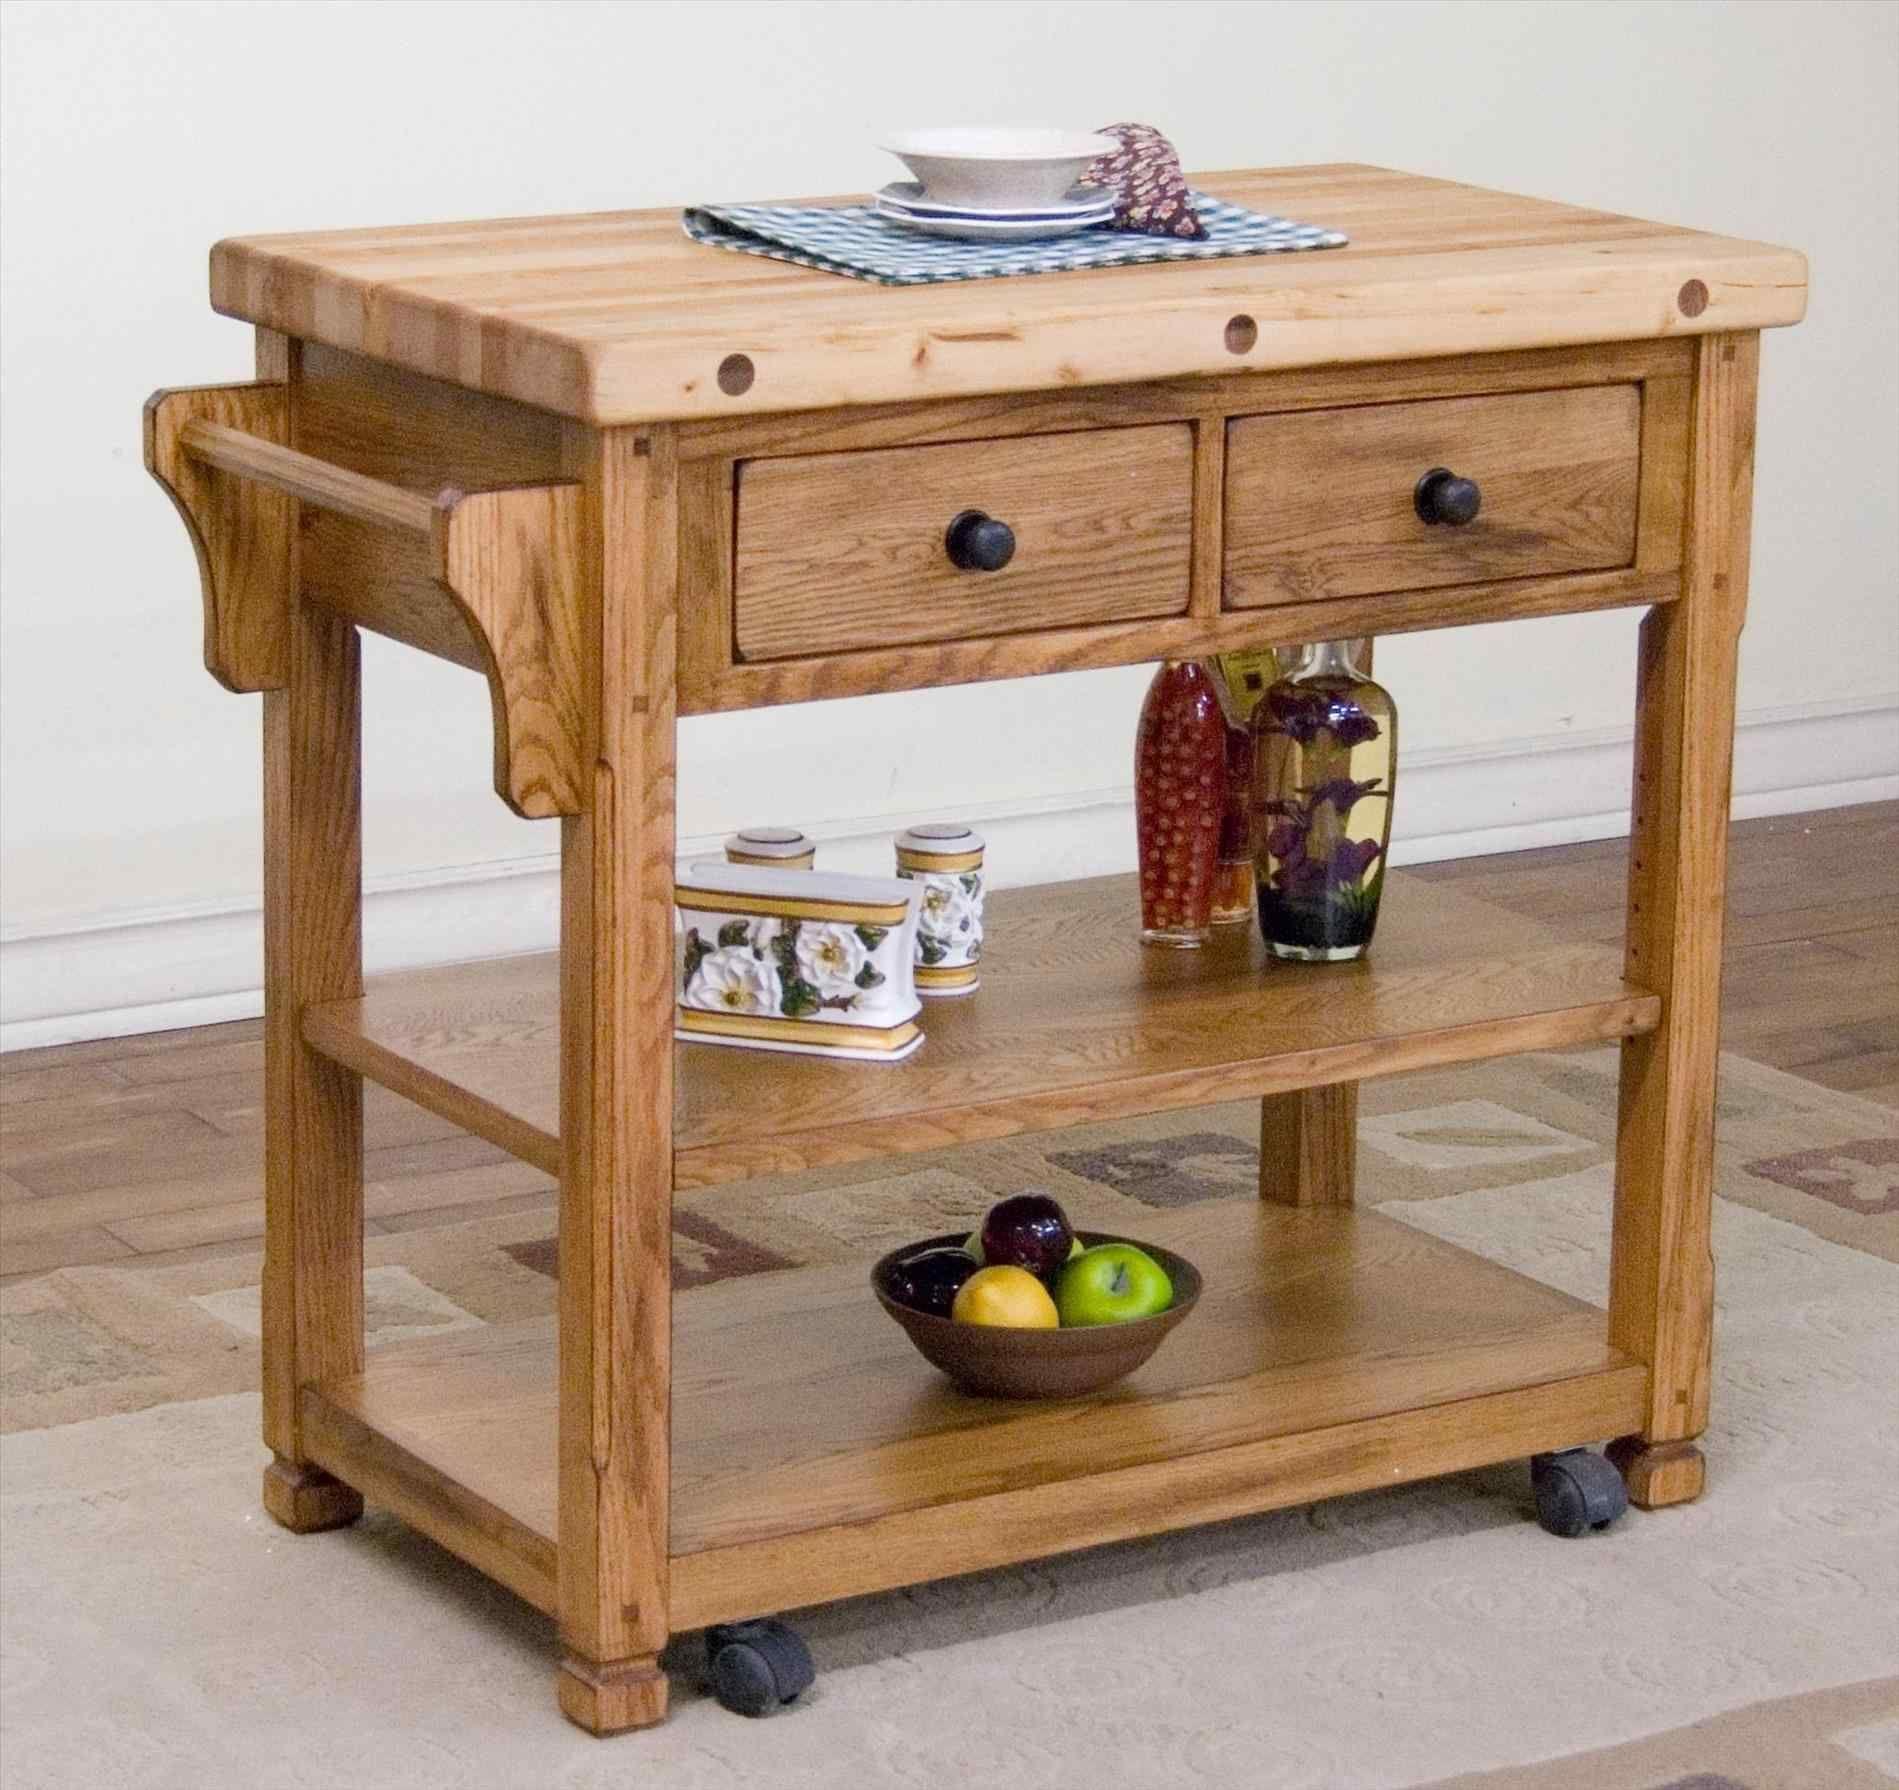 New Kitchen Prep Table With Storage At Hoangphaphaingoai Info Kitchen Work Tables Butcher Block Island Kitchen Portable Kitchen Island